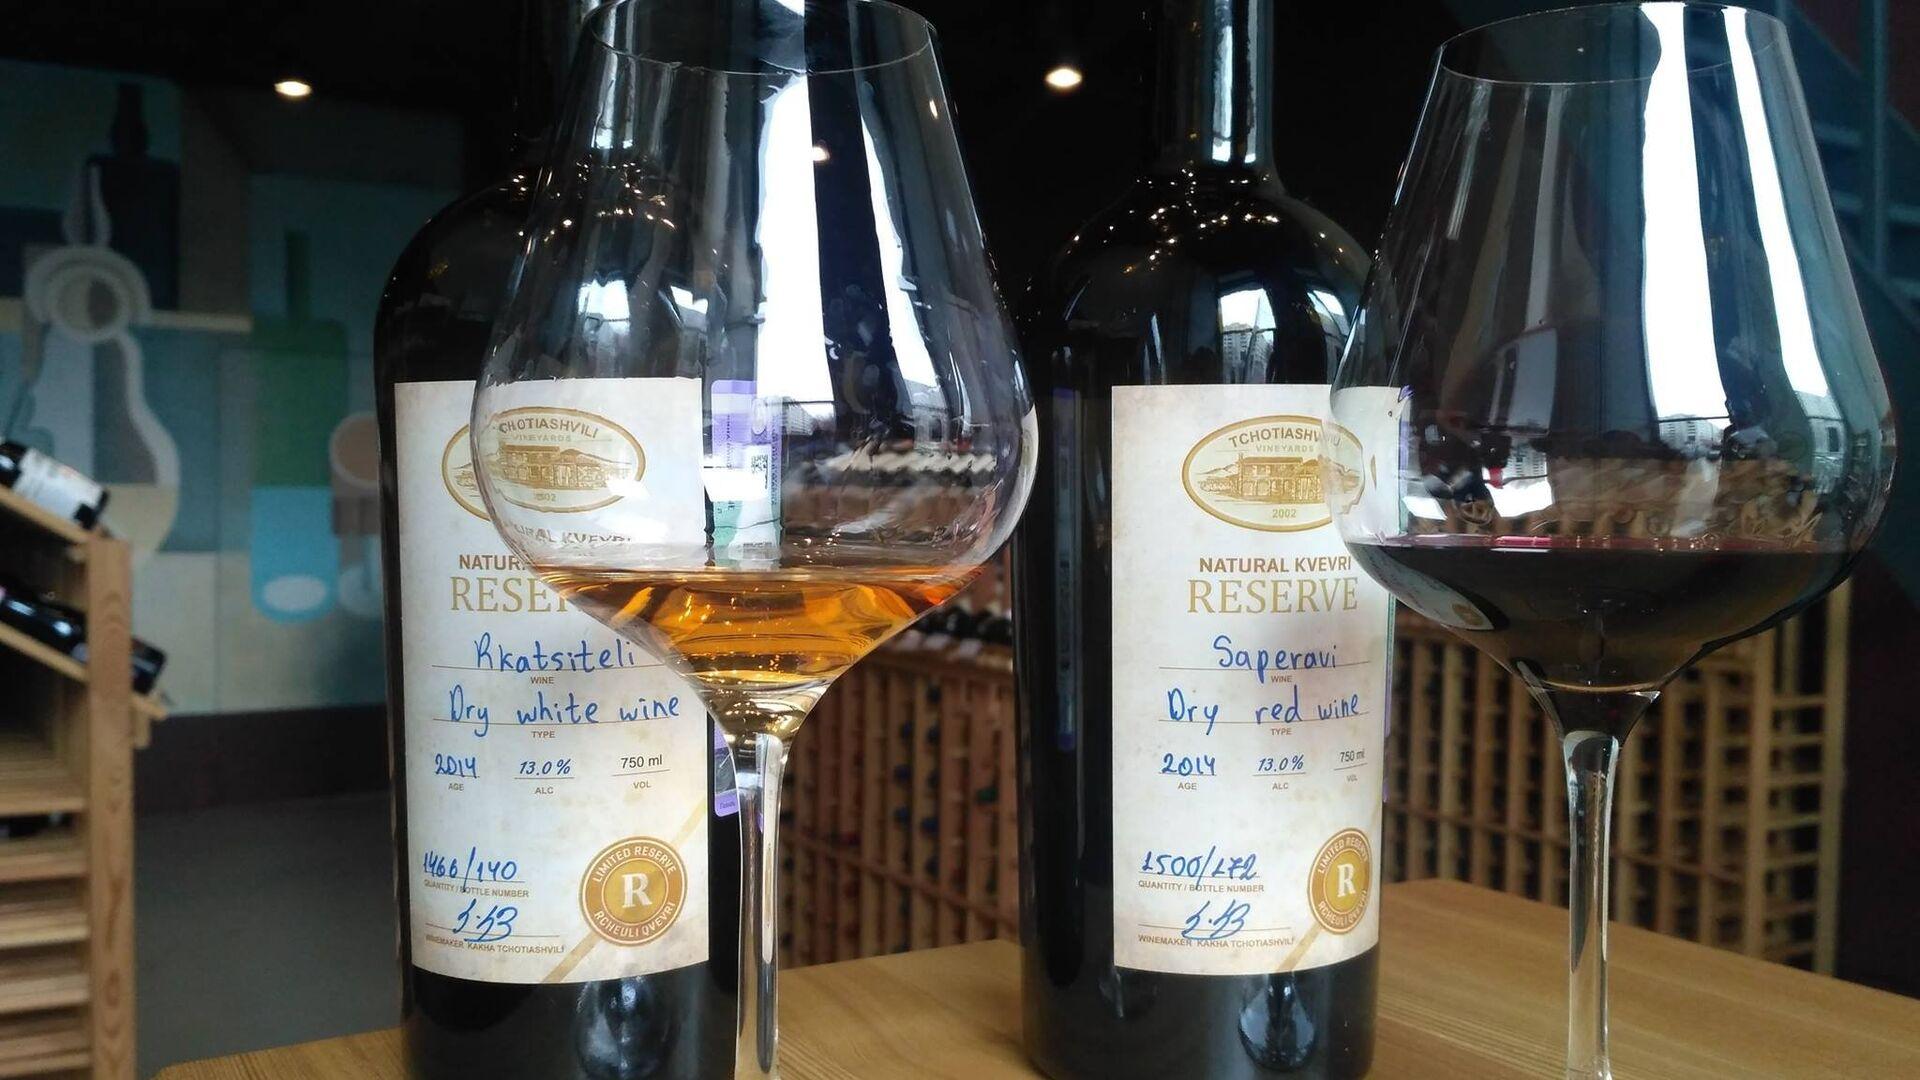 Грузинские вина в винотеке il vino - Sputnik Грузия, 1920, 08.09.2021